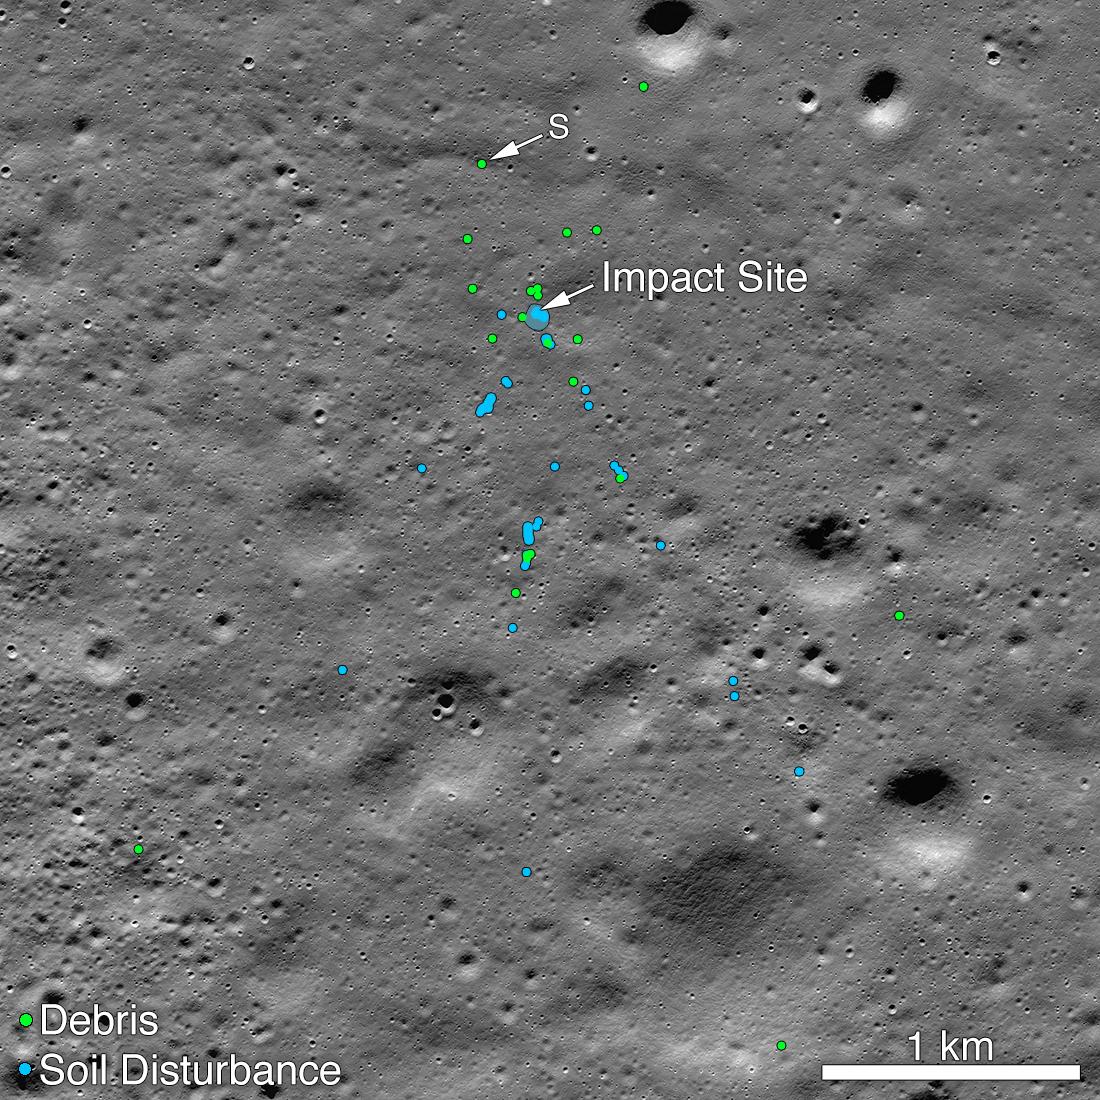 НАСА обнаружило на Луне обломки индийского посадочного модуля «Викрам».Вокруг Света. Украина